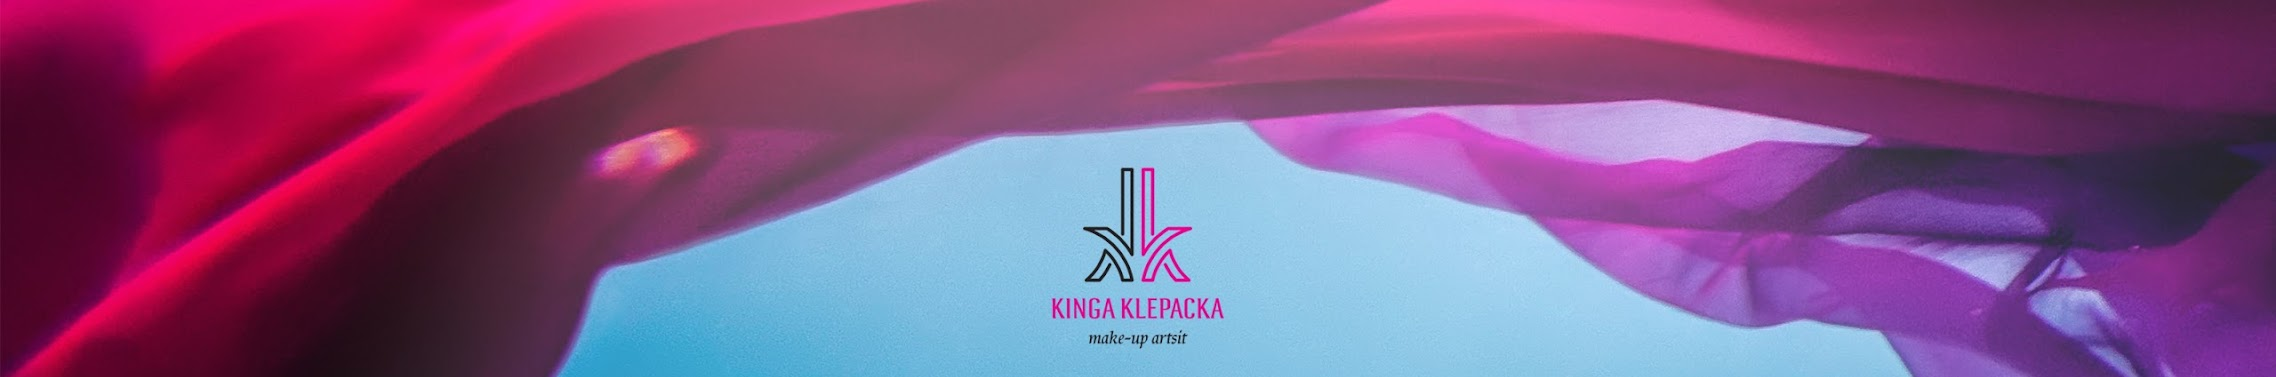 Kinga Klepacka MakeUp